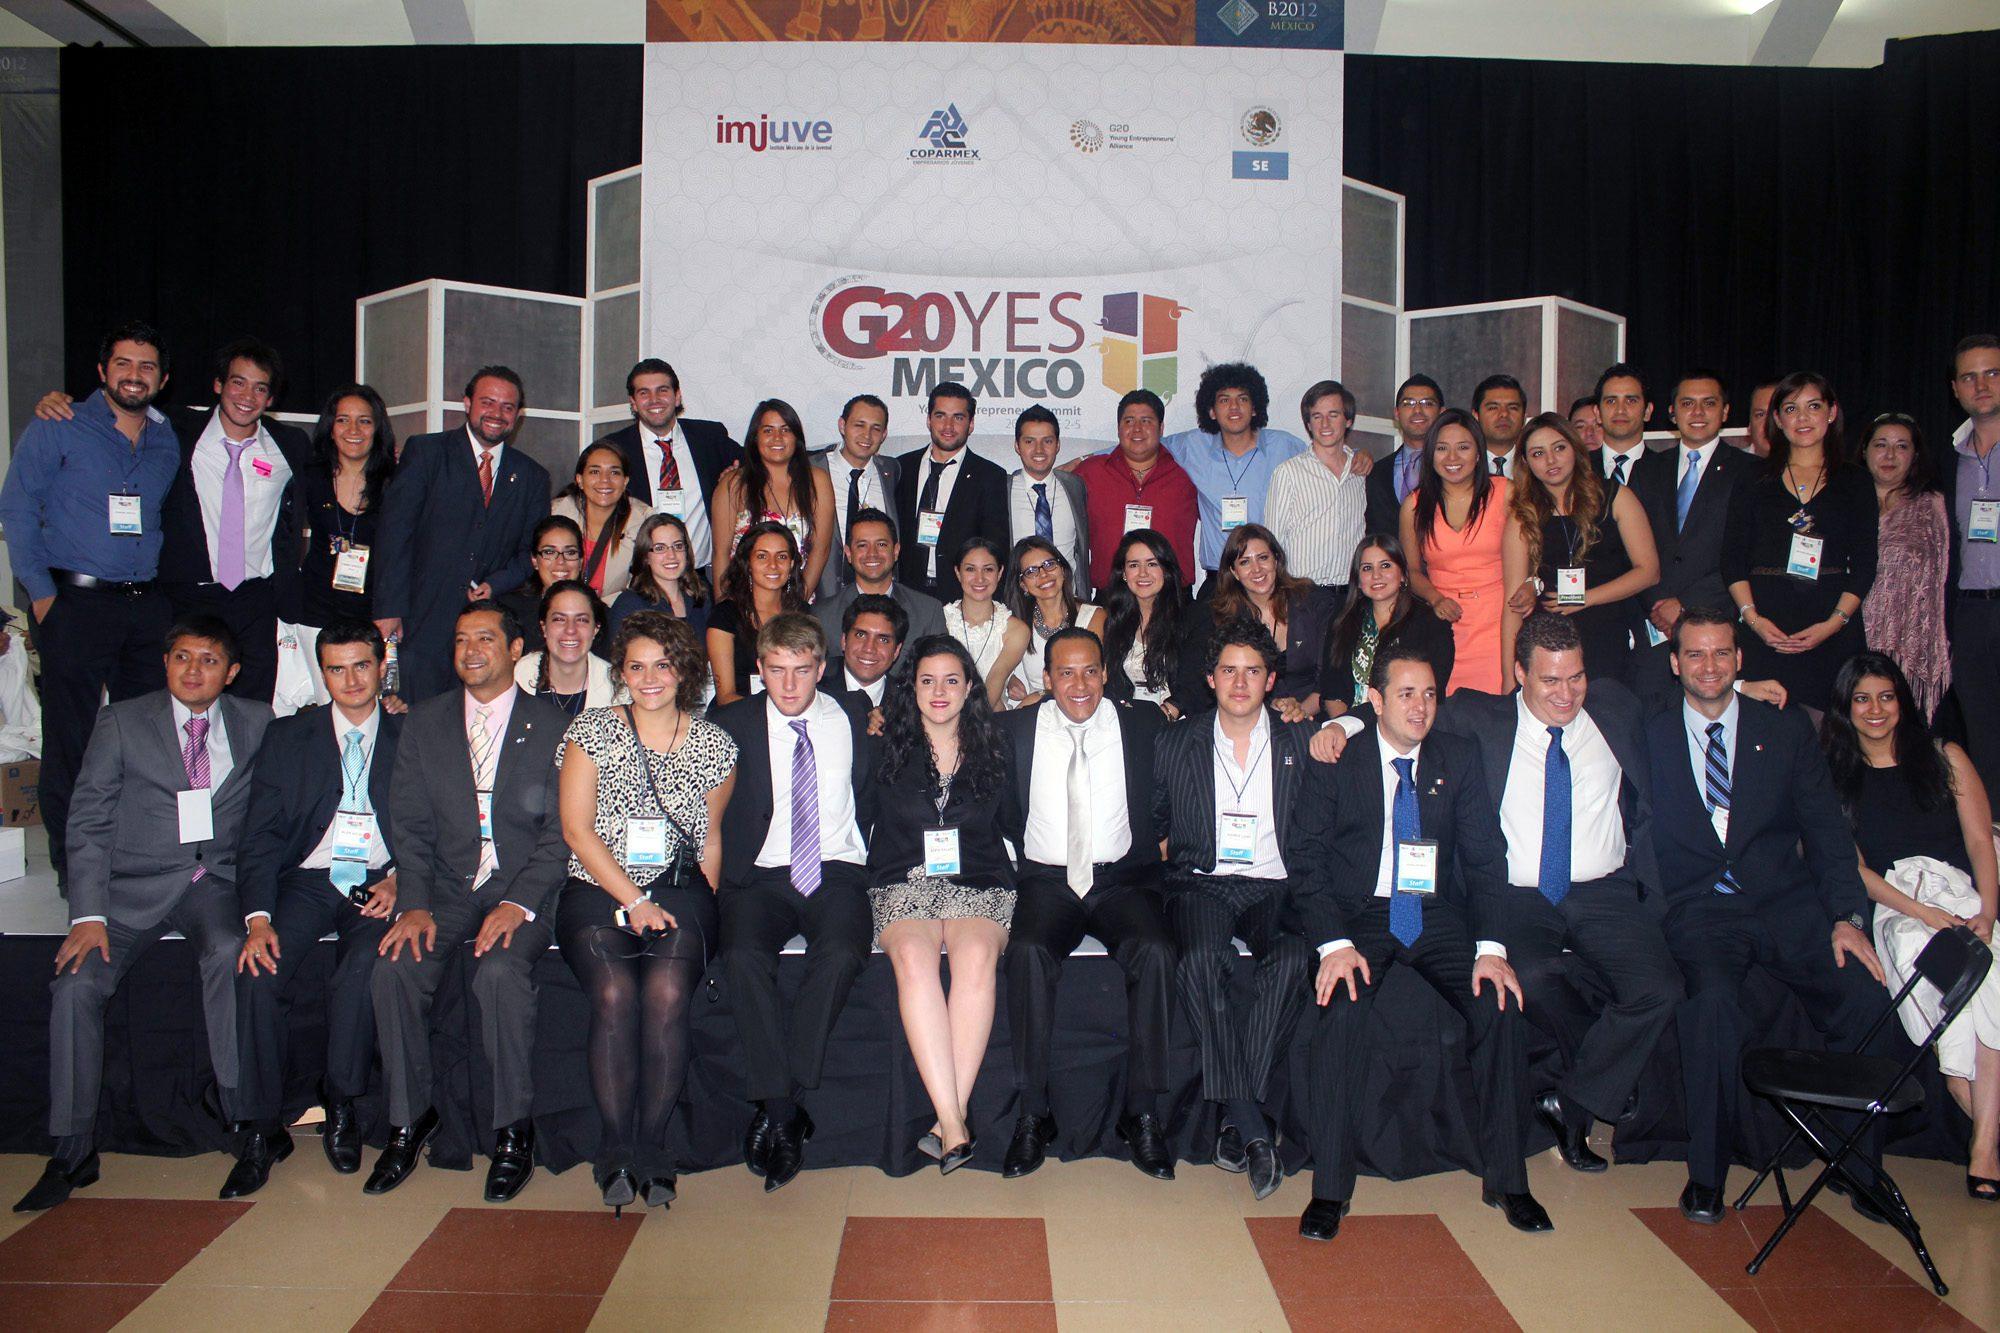 g20-mexico-2012-entrepreneurs-innovation-création-emplois-jeunes